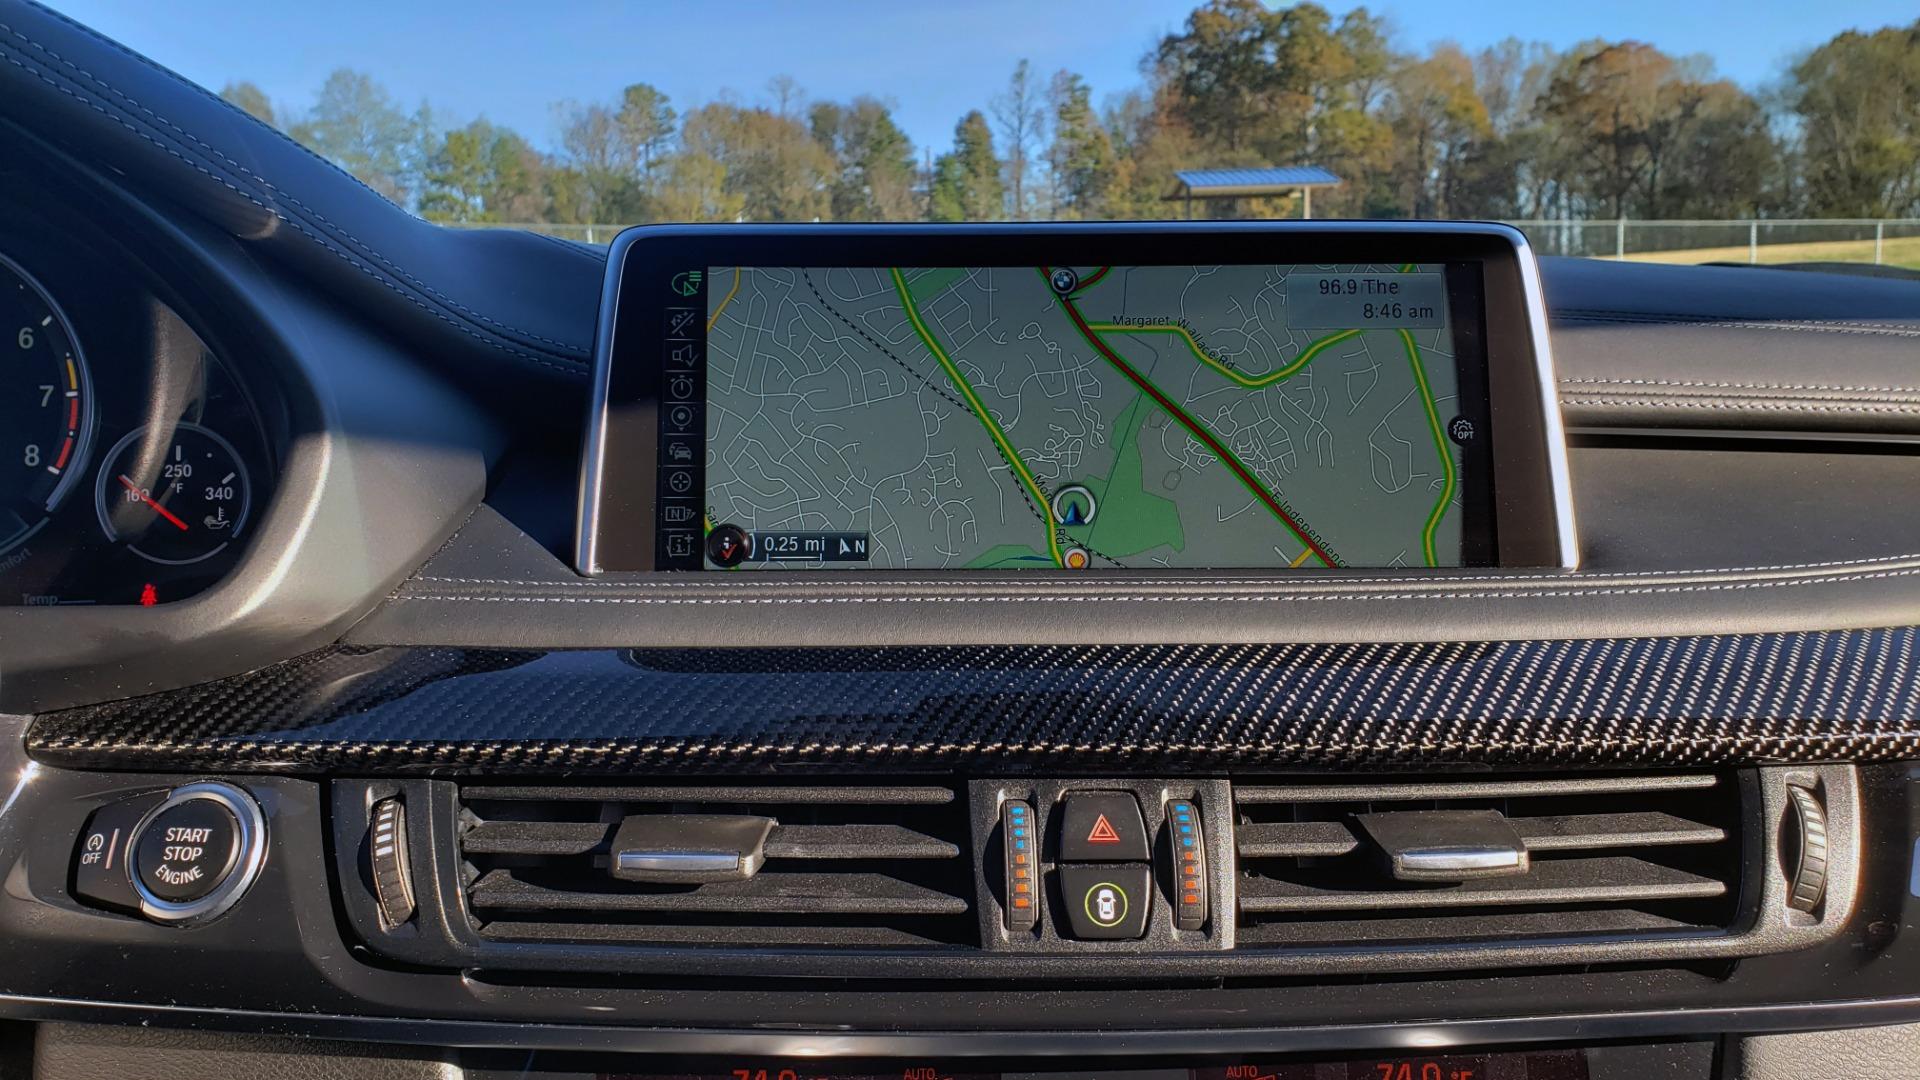 Used 2016 BMW X6 M EXEC PKG / DRVR ASST / NAV / SUNROOF / BLIND SPOT / REARVIEW for sale Sold at Formula Imports in Charlotte NC 28227 56